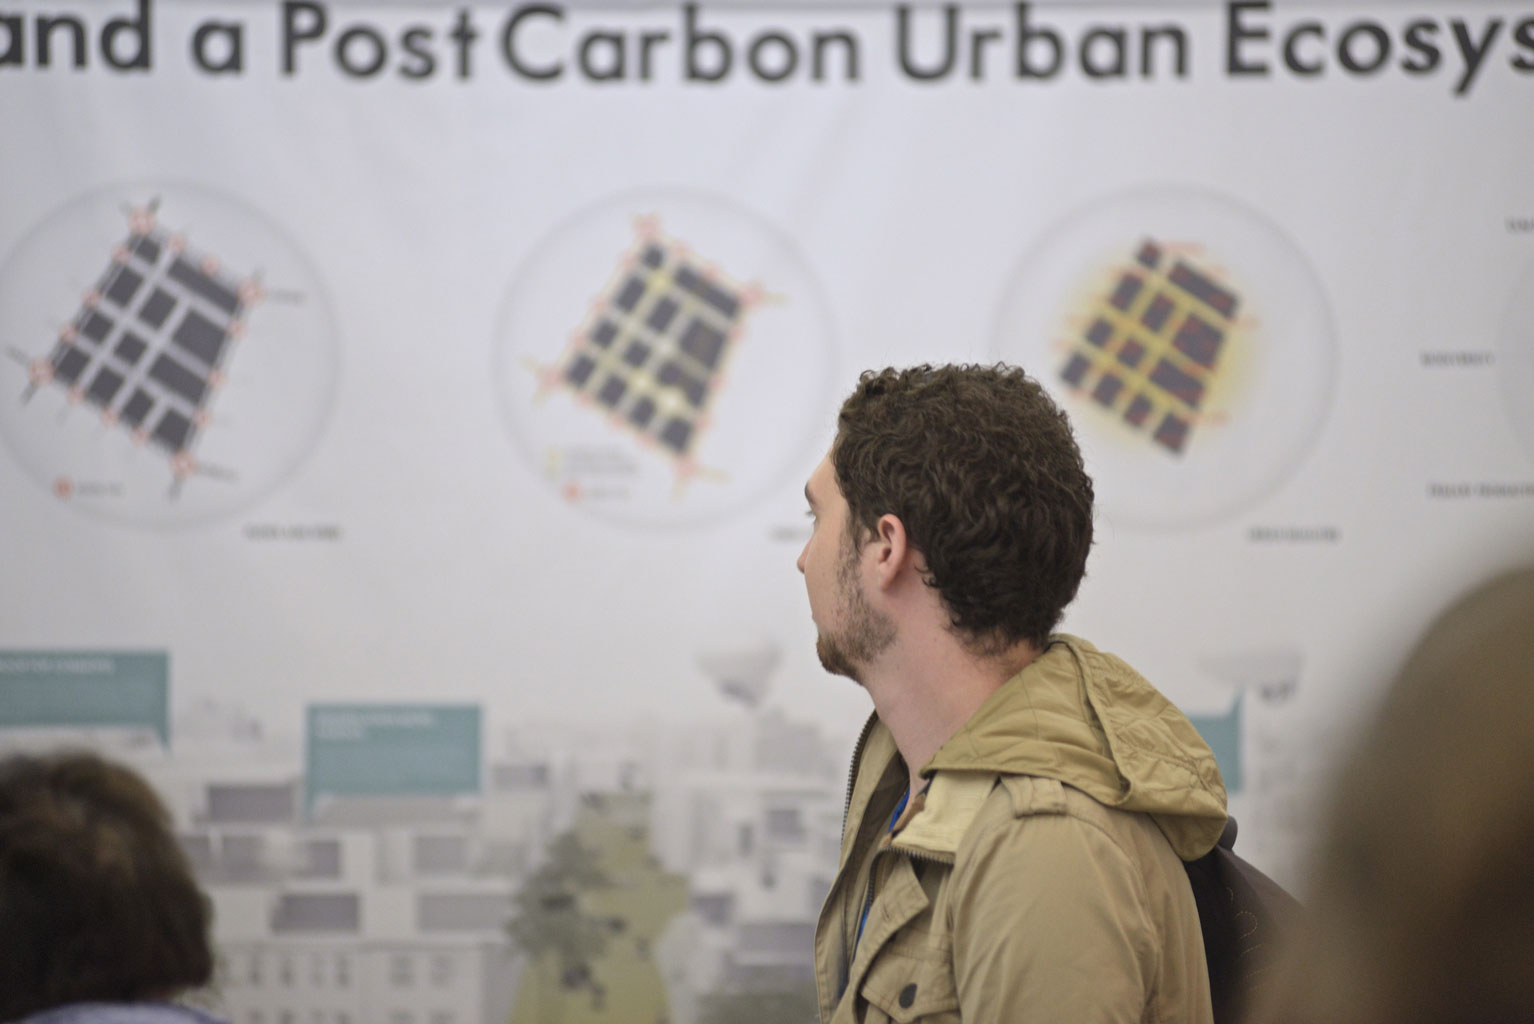 SmarterThanCar_r+d-postcarbon-vienna_VDW_2015_C_Paris-Tsitsos_14